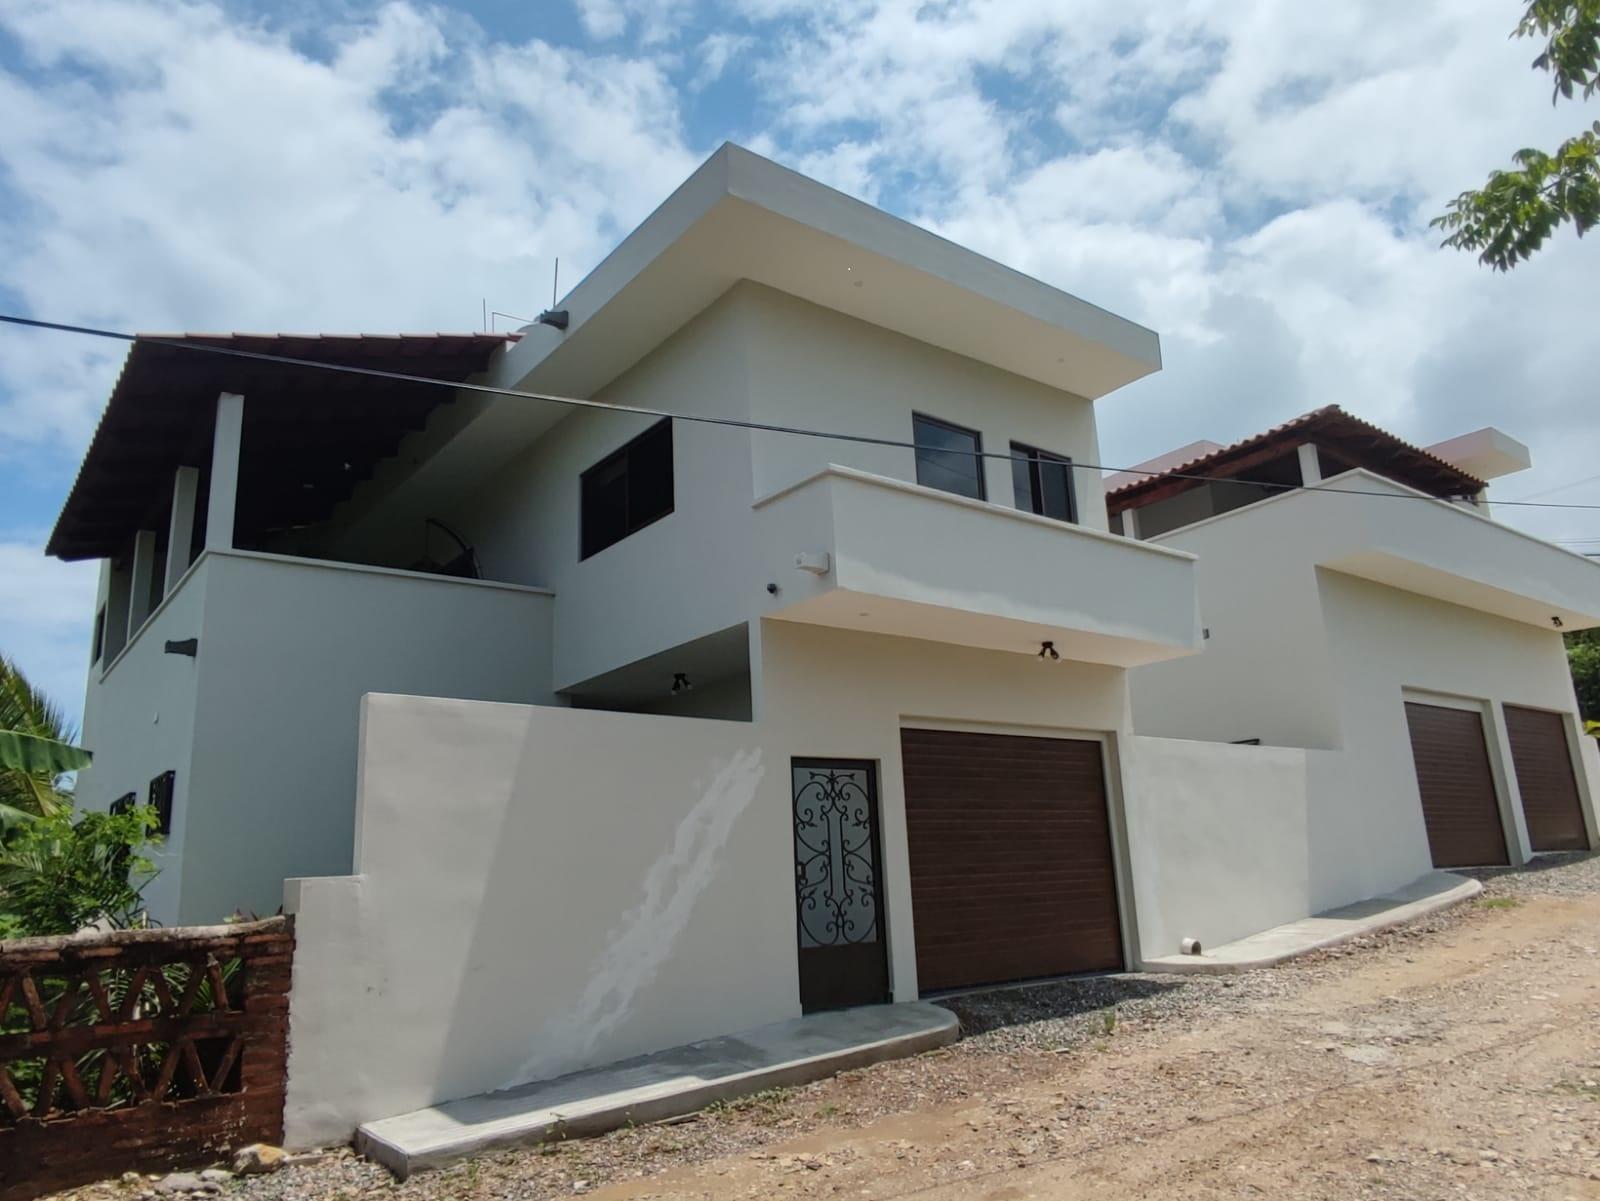 18 C. Loma, Casa Gio´s Litibu, Riviera Nayarit, NA